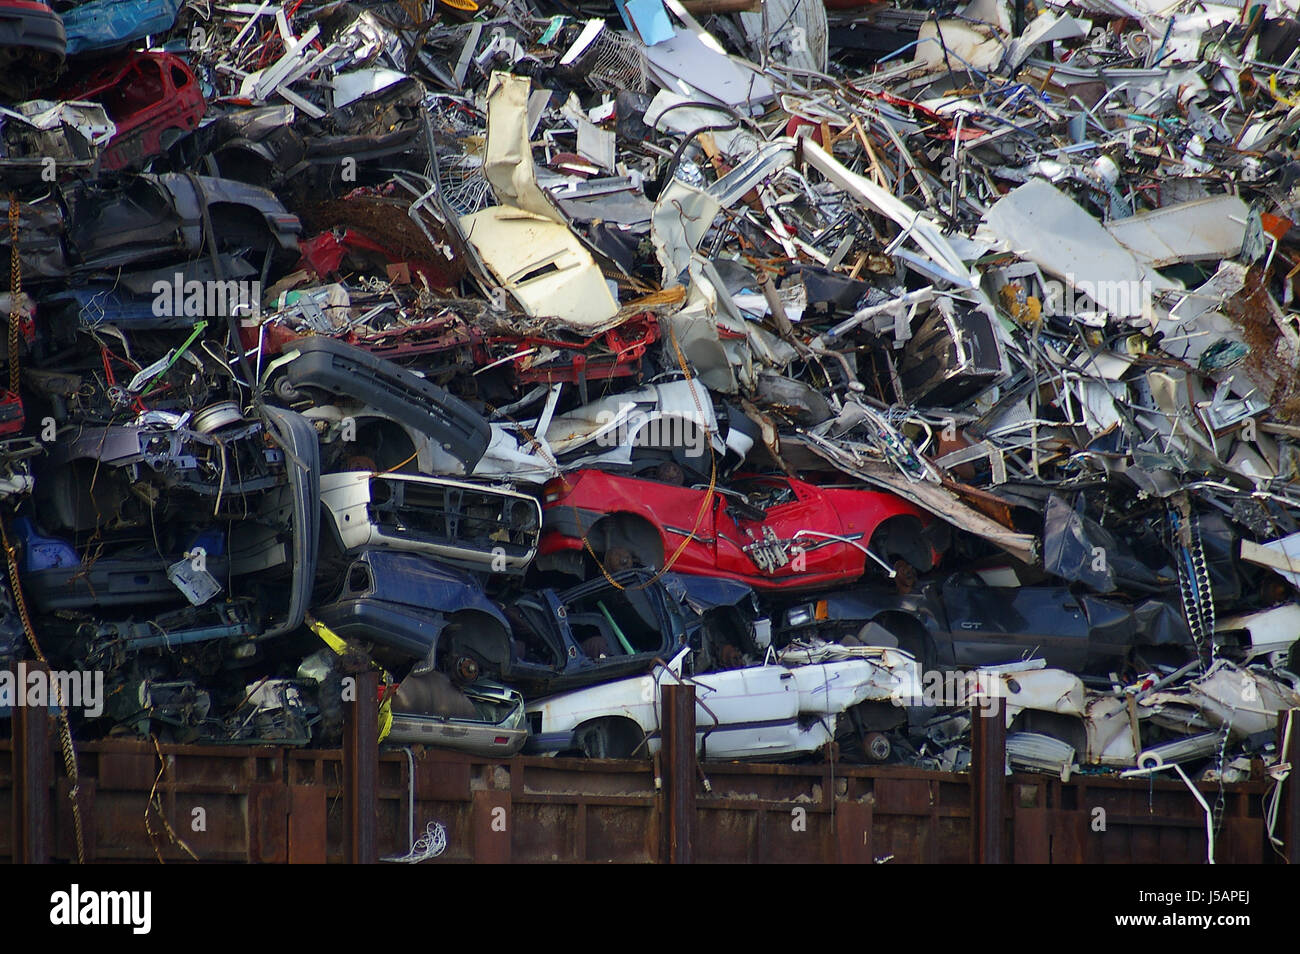 harbor transport sheet metal harbours raw material scrap utilization exploit Stock Photo